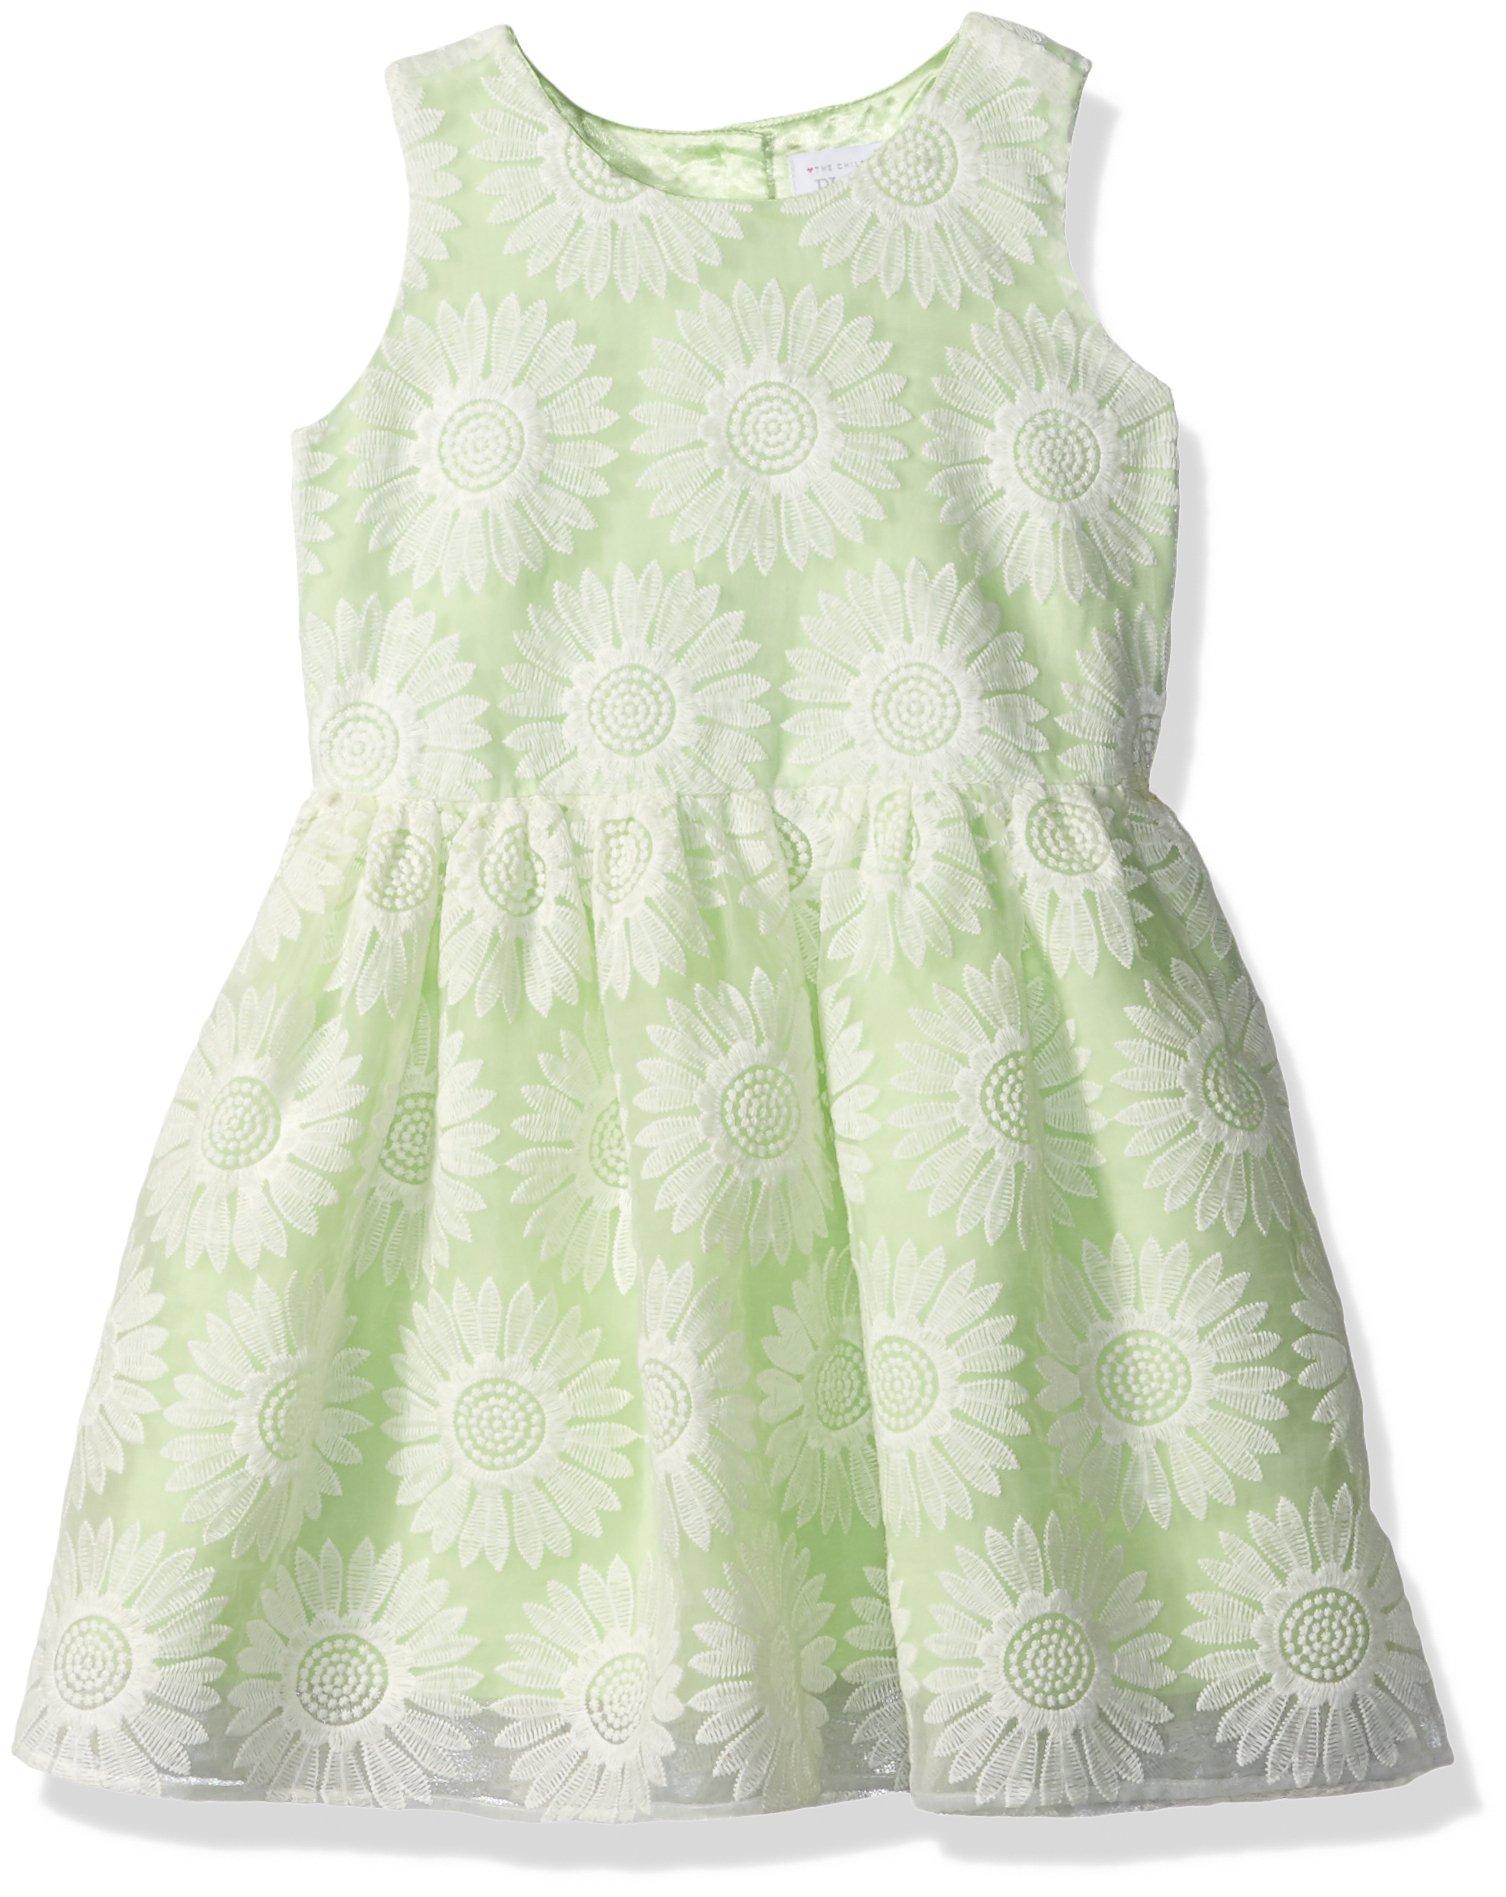 8f1068fda43c Galleon - The Children s Place Baby Girls  Toddler Sleeveless Dressy ...